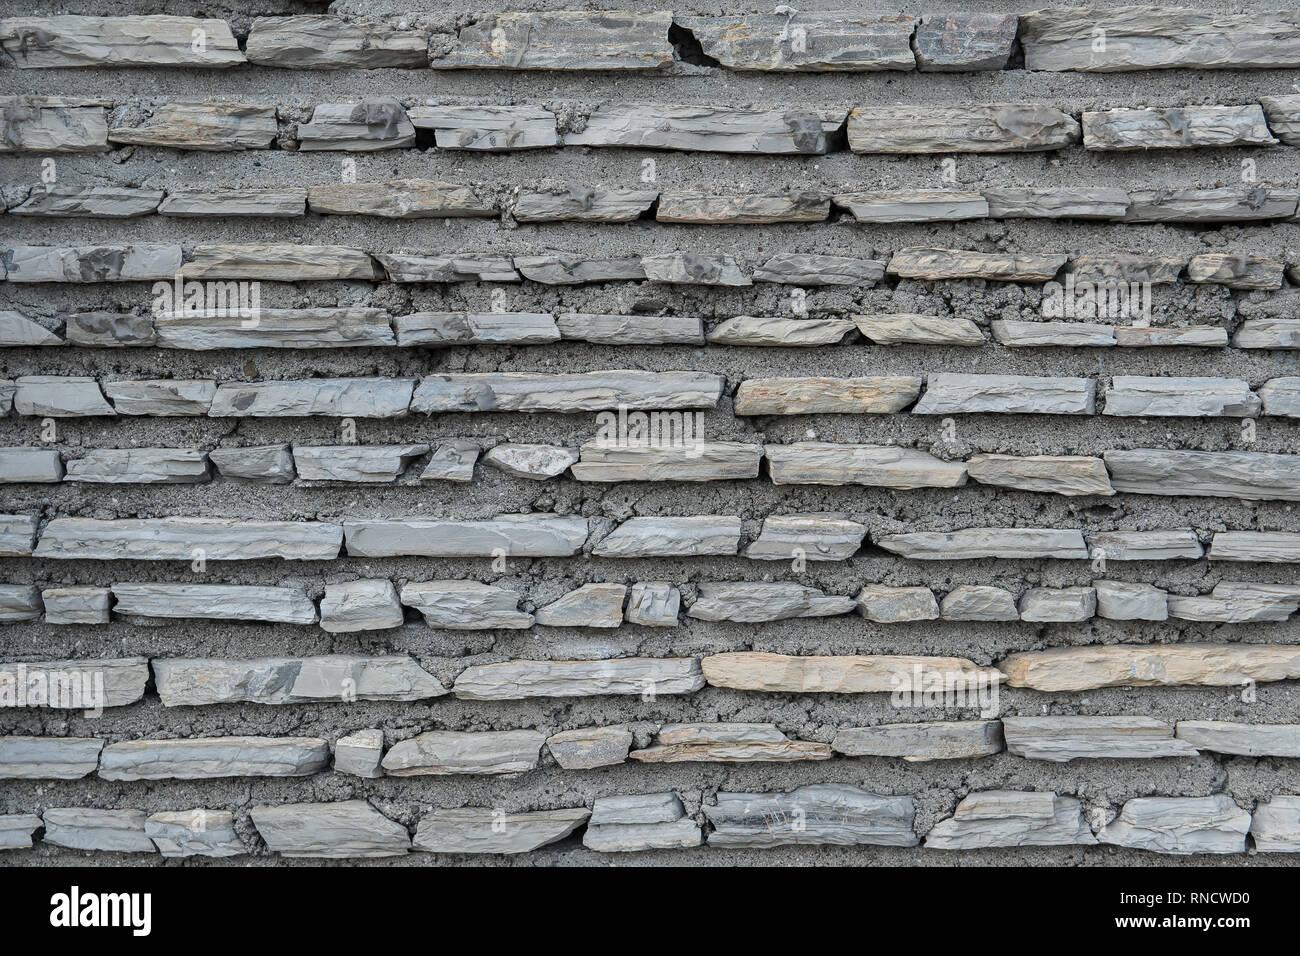 Flat Bricks With Cement Texture Stone Surface Closeup